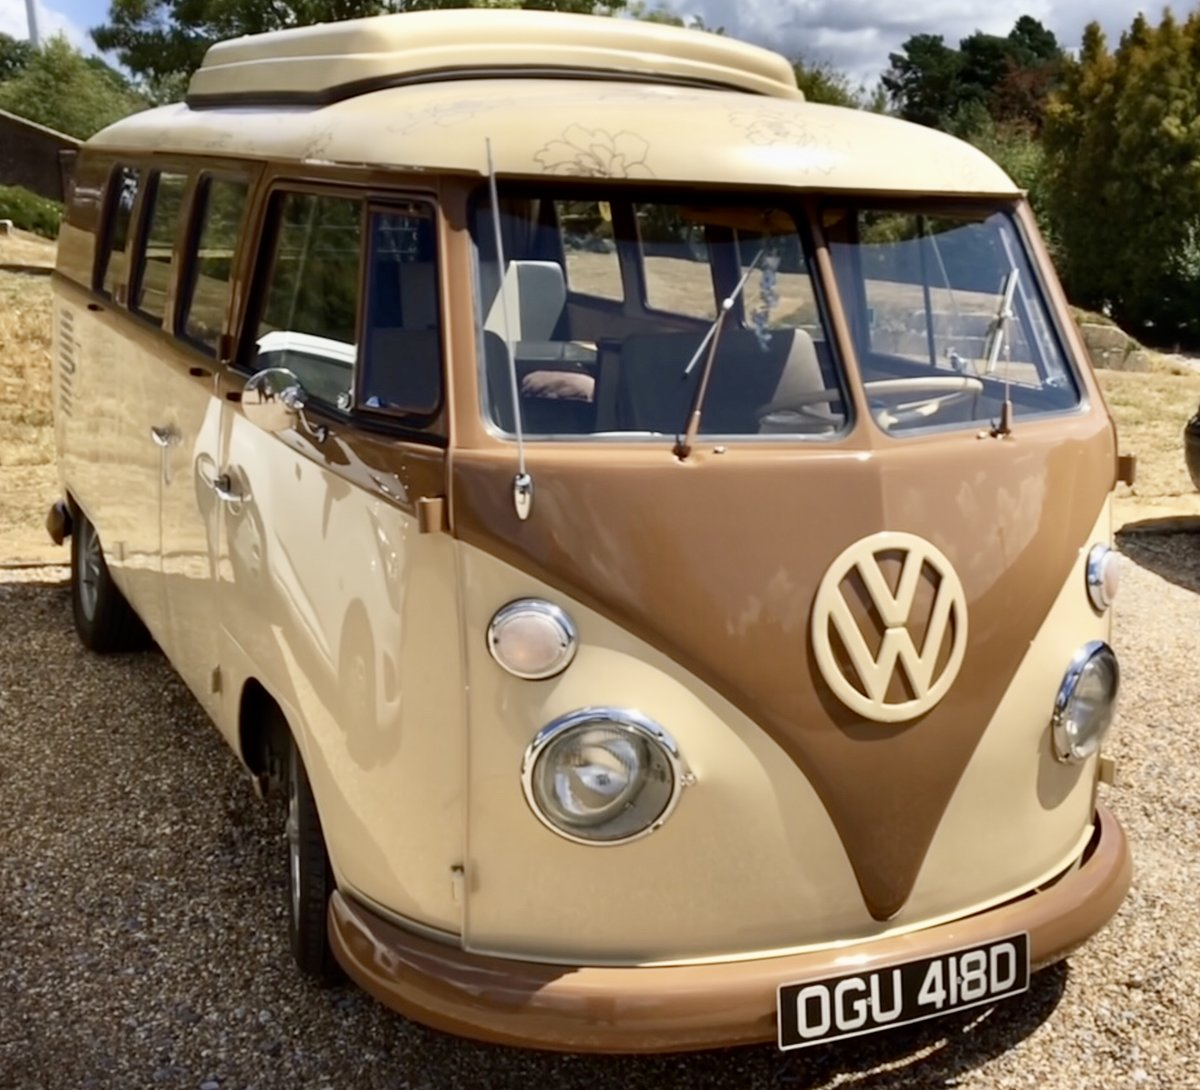 1966 VW Volkswagen Type 2 Split Screen Camper For Sale (picture 1 of 12)